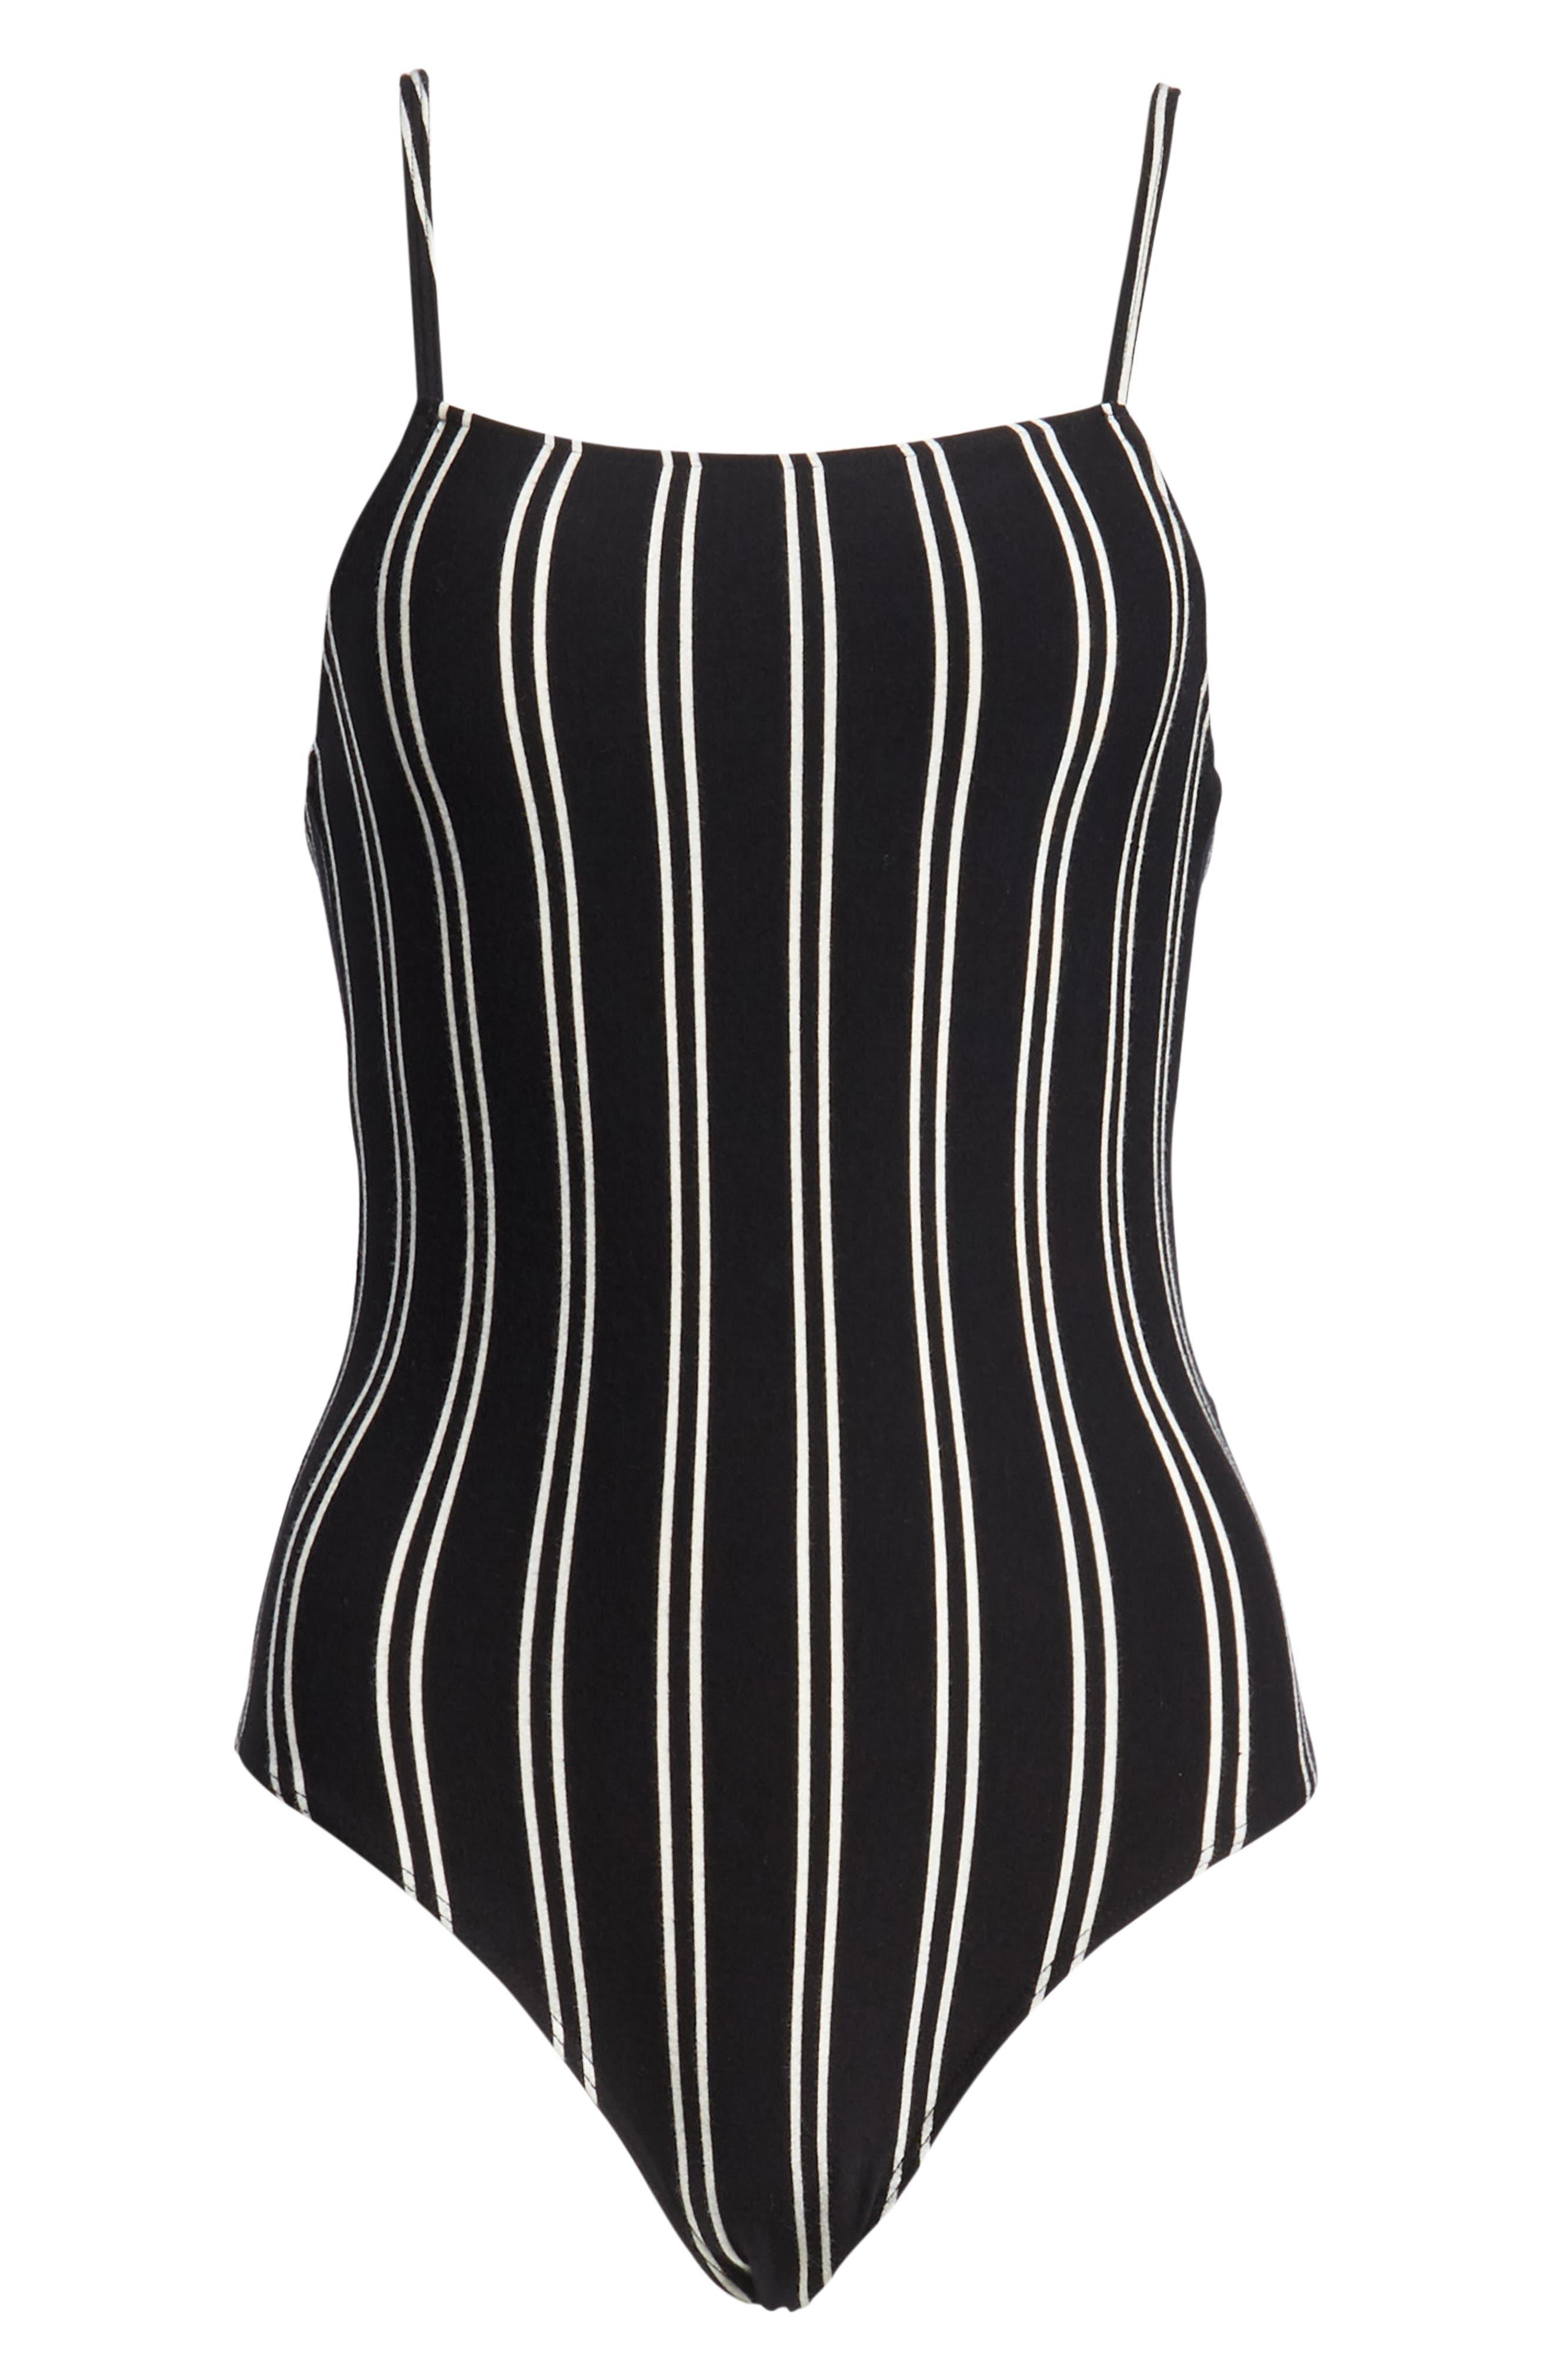 Lockette Stripe Bodysuit,                             Alternate thumbnail 6, color,                             005